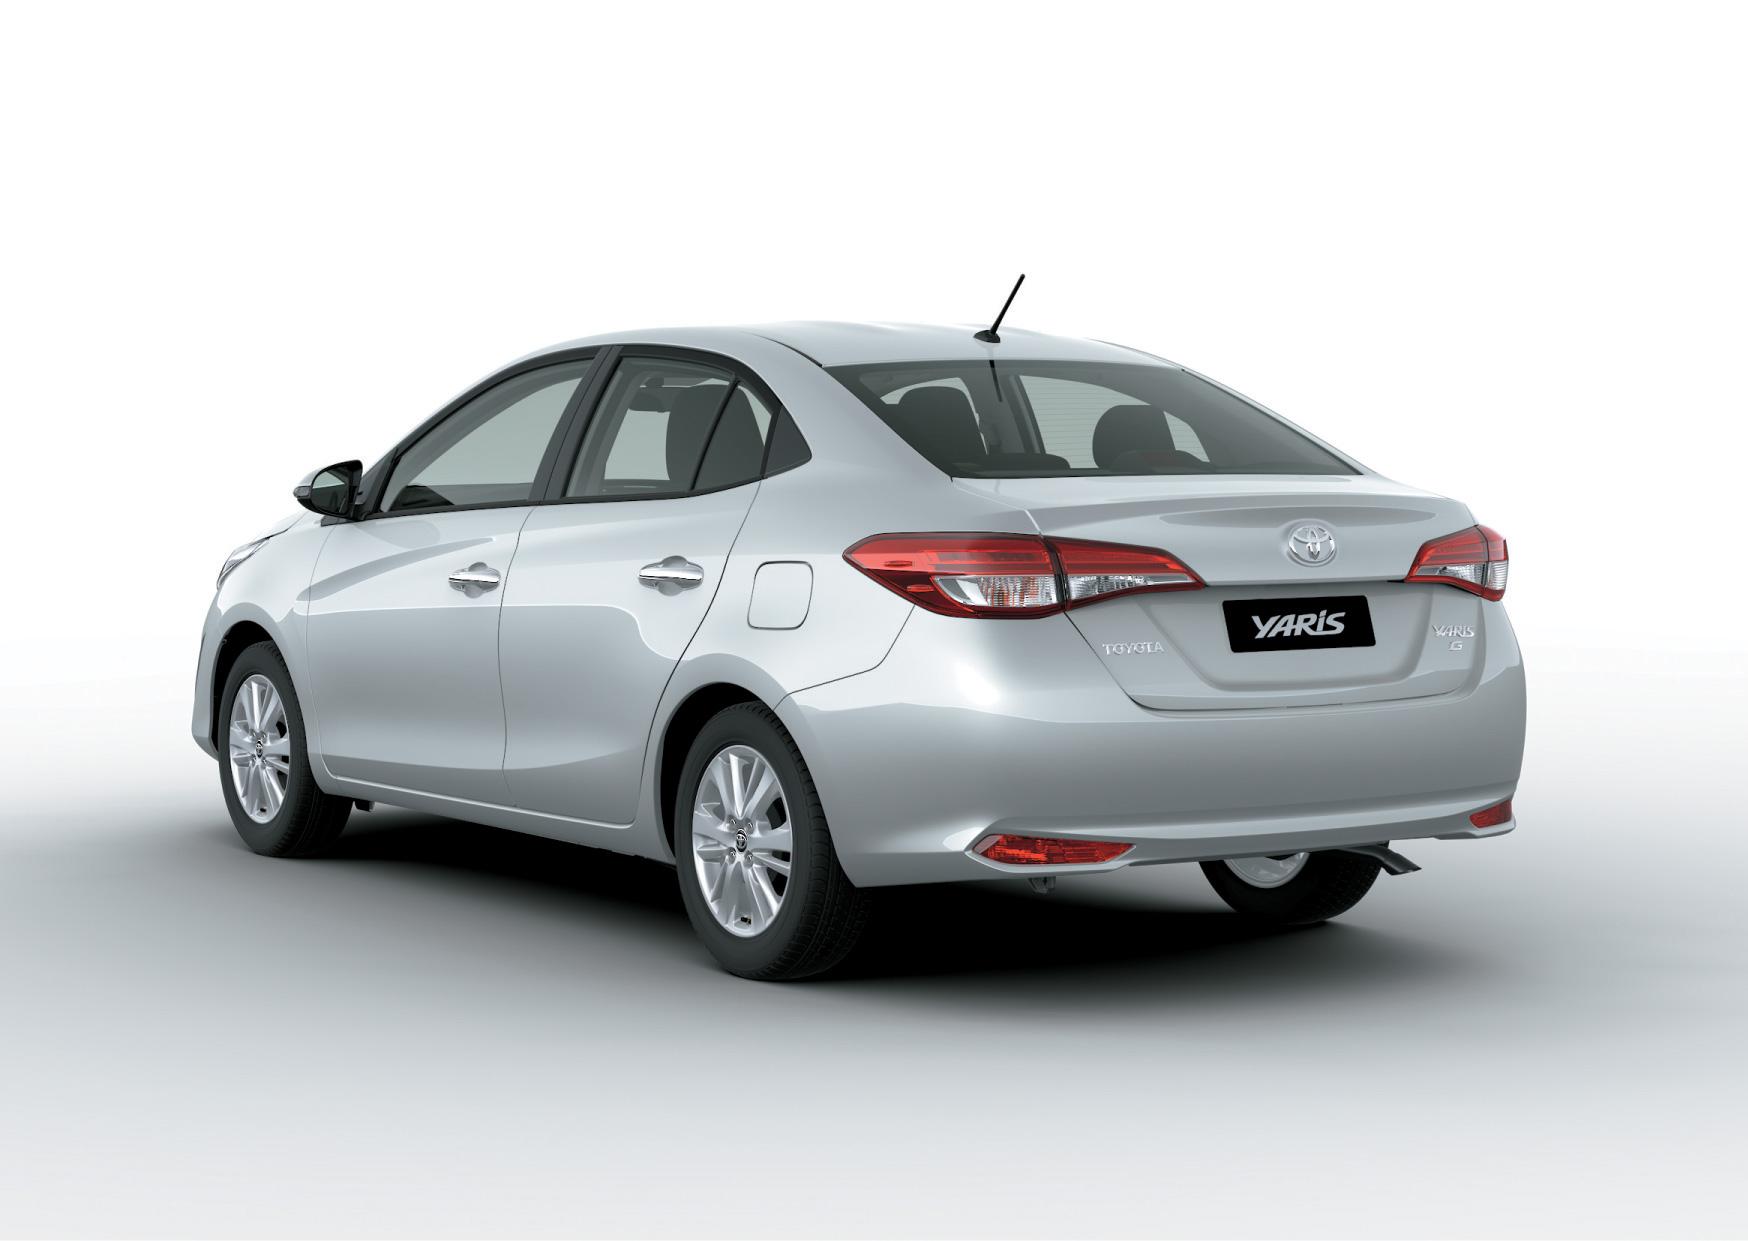 Prix Toyota Yaris Sedan 1 33l Style Neuve 53 600 Dt